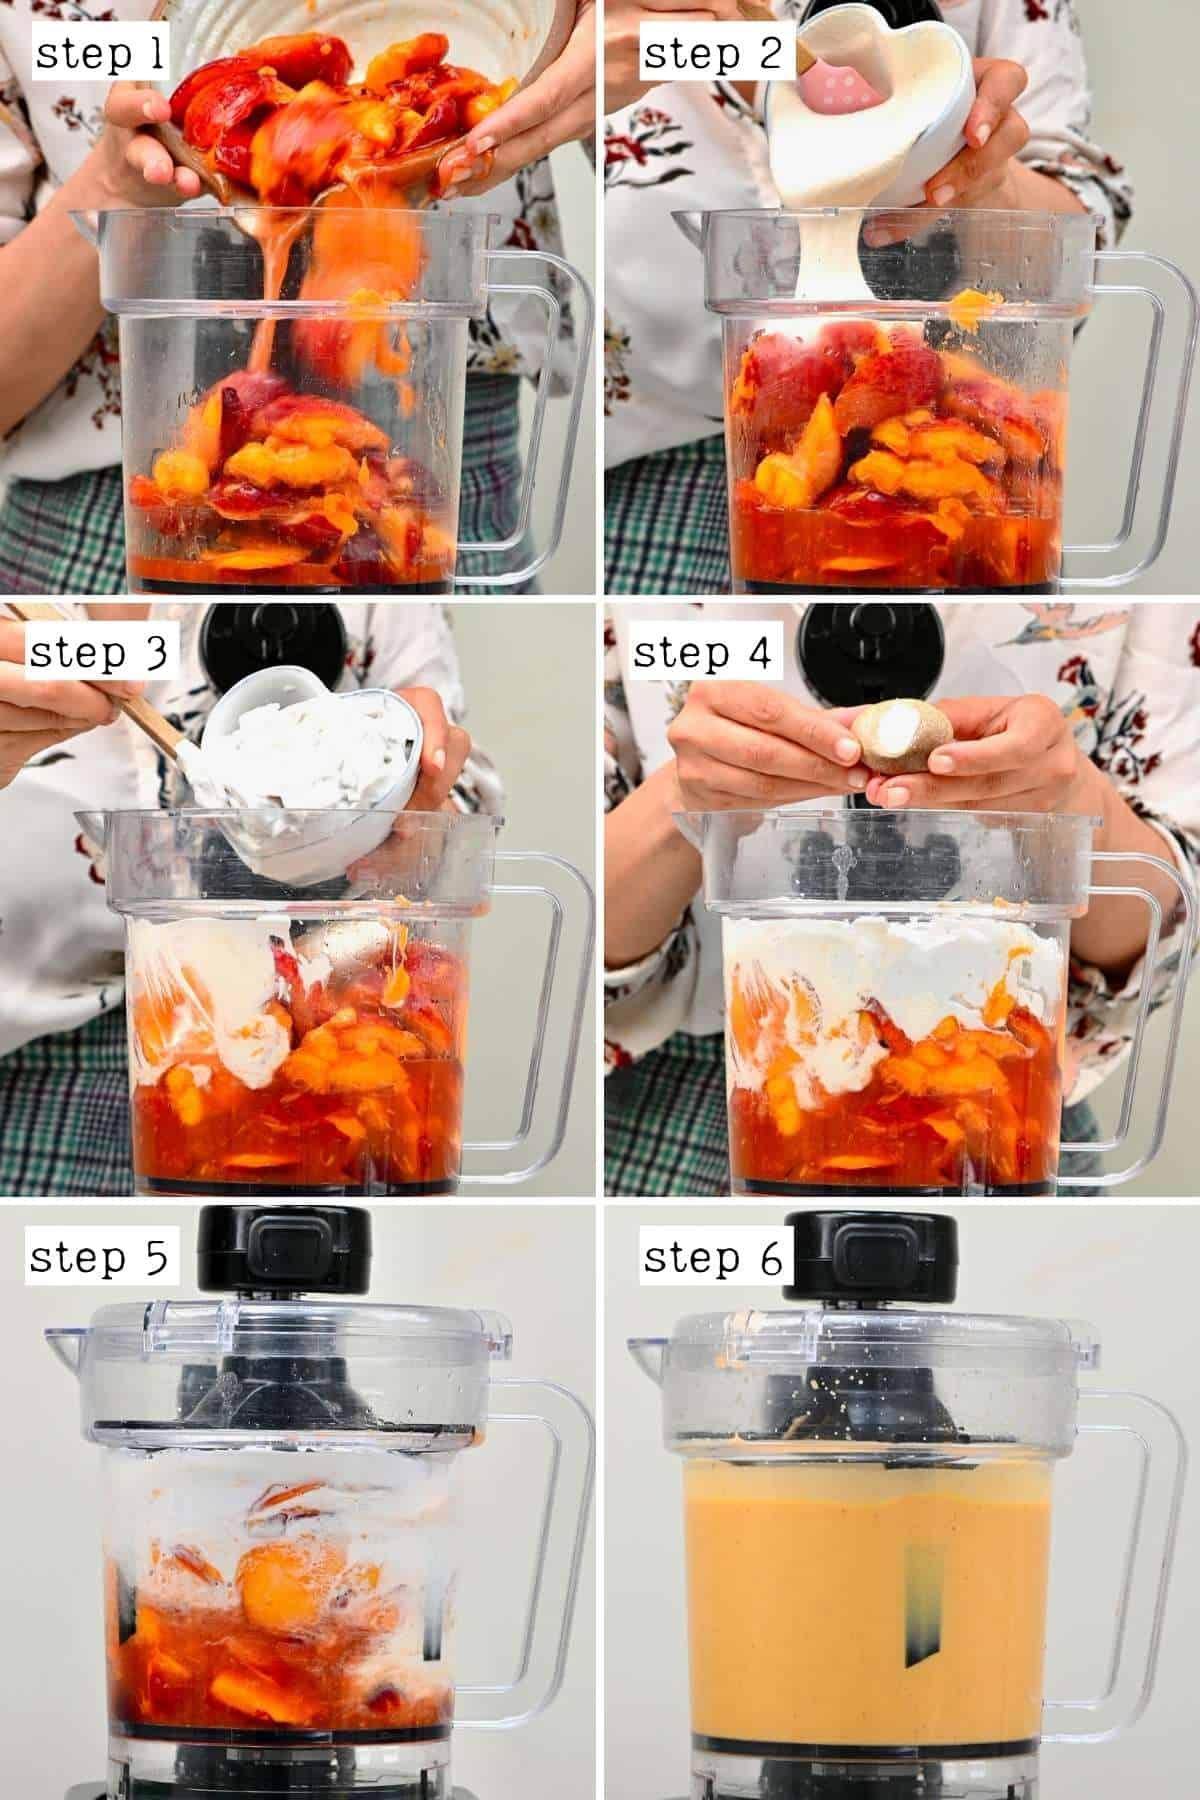 Steps for preparing base for peach ice cream